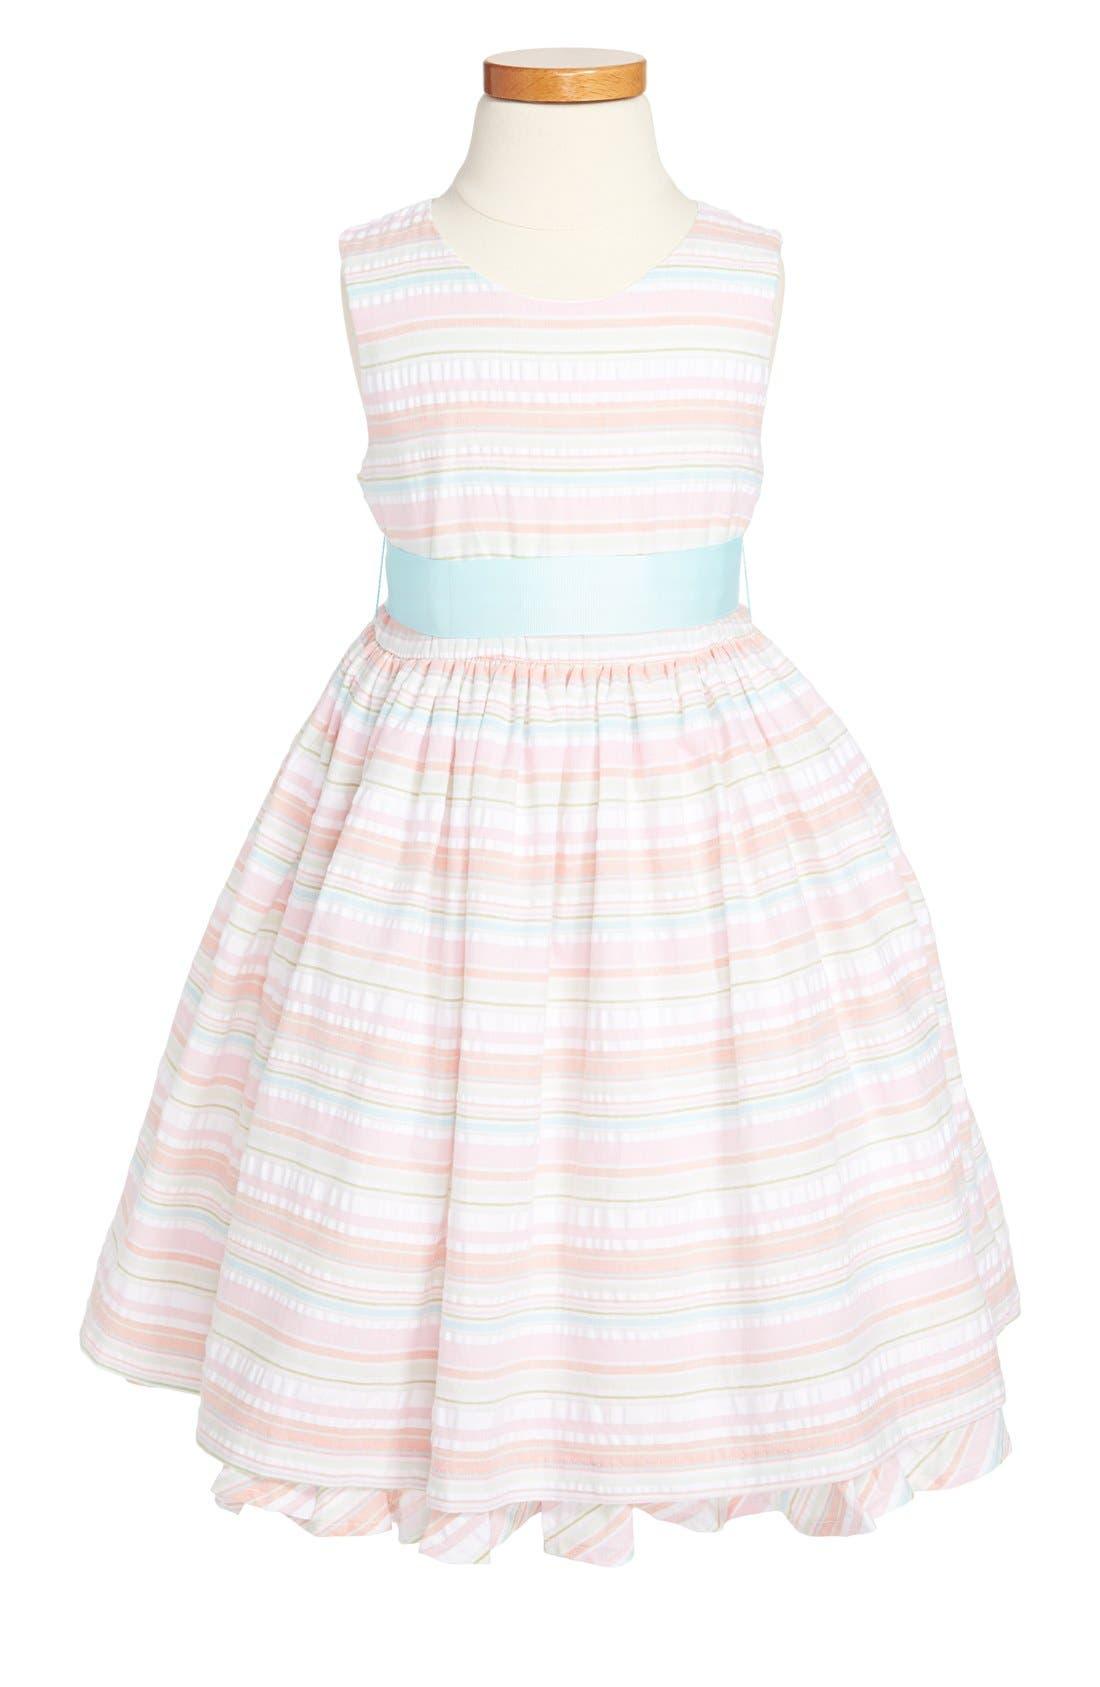 Alternate Image 1 Selected - Pippa & Julie Seersucker Stripe Cotton Dress (Little Girls & Big Girls)